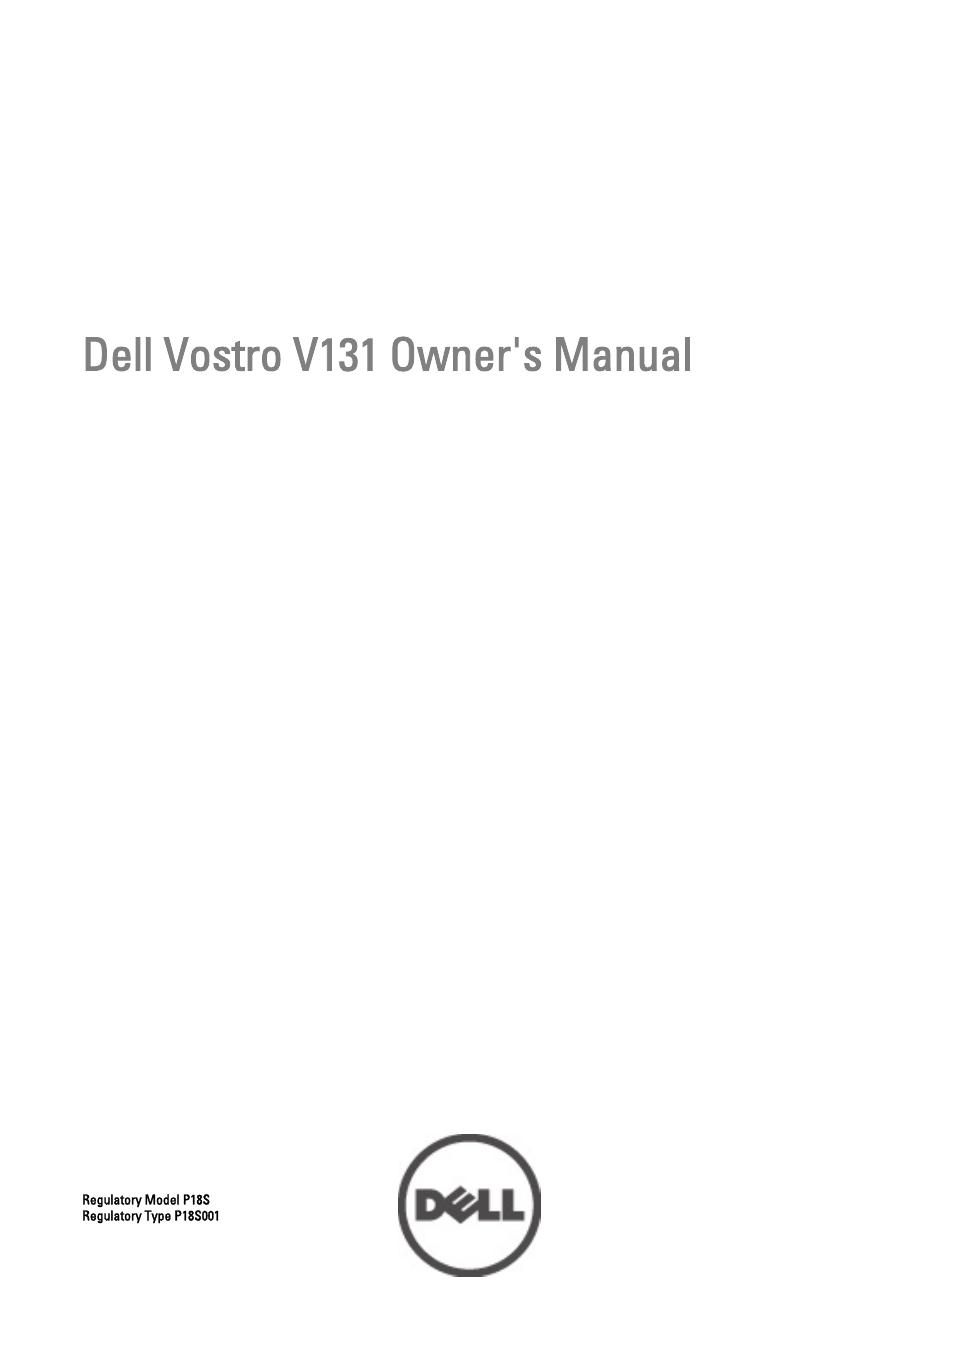 dell vostro v131 mid 2011 user manual 90 pages rh manualsdir com dell vostro v131 service manual pdf dell v131 manual